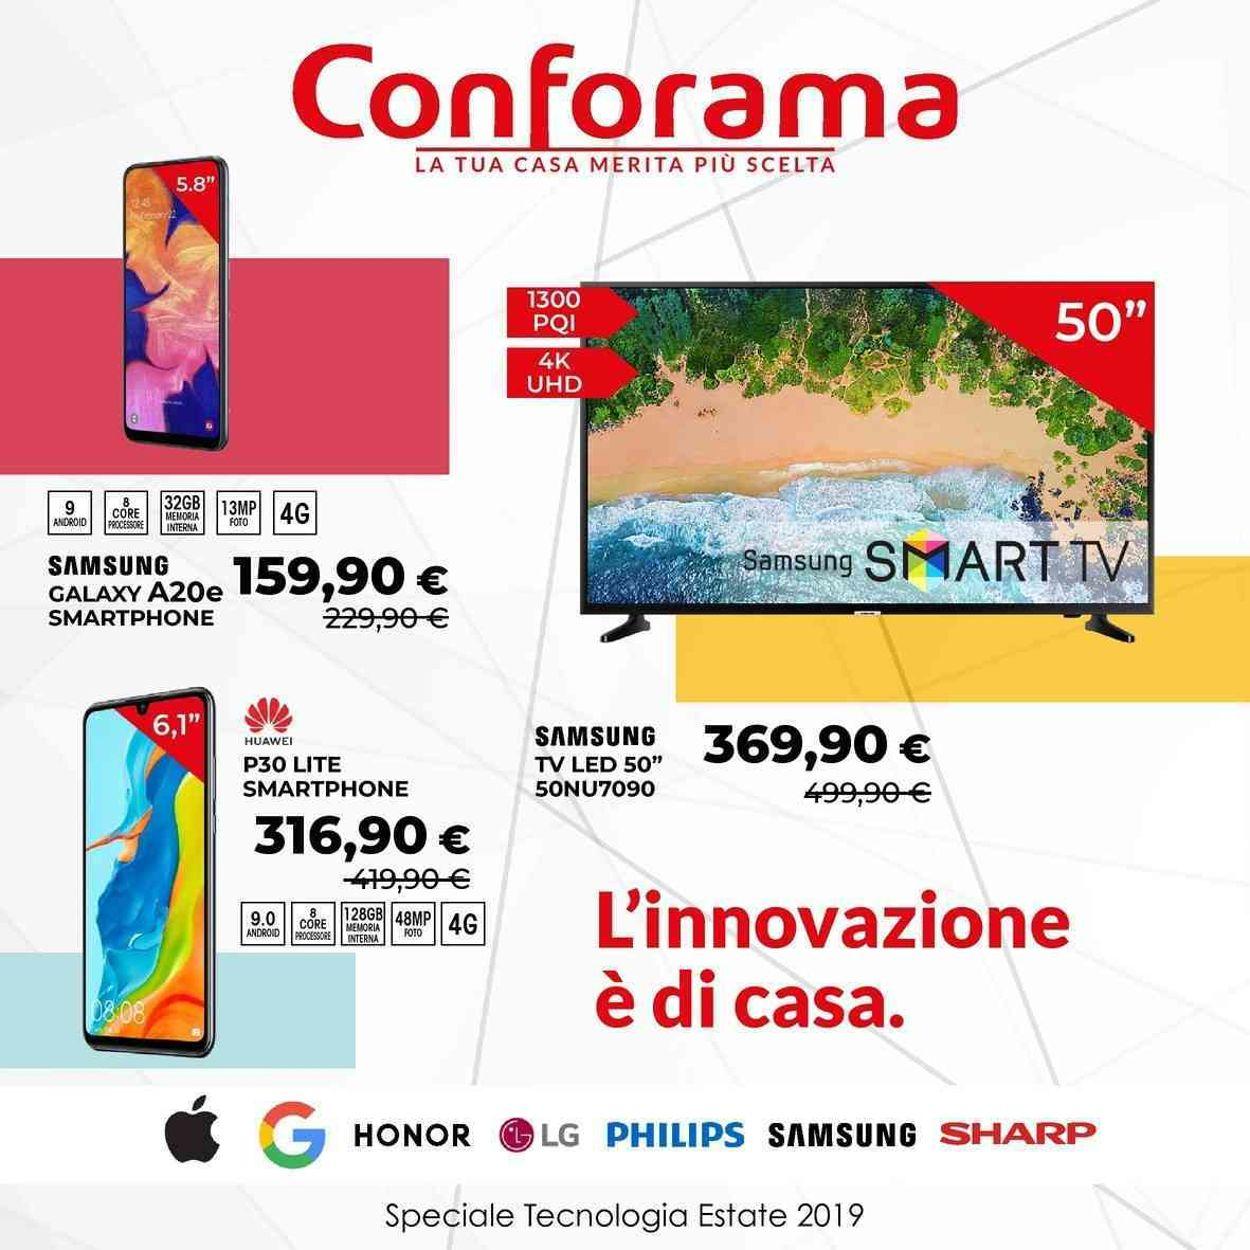 Volantino Conforama - Offerte 28/06-21/07/2019